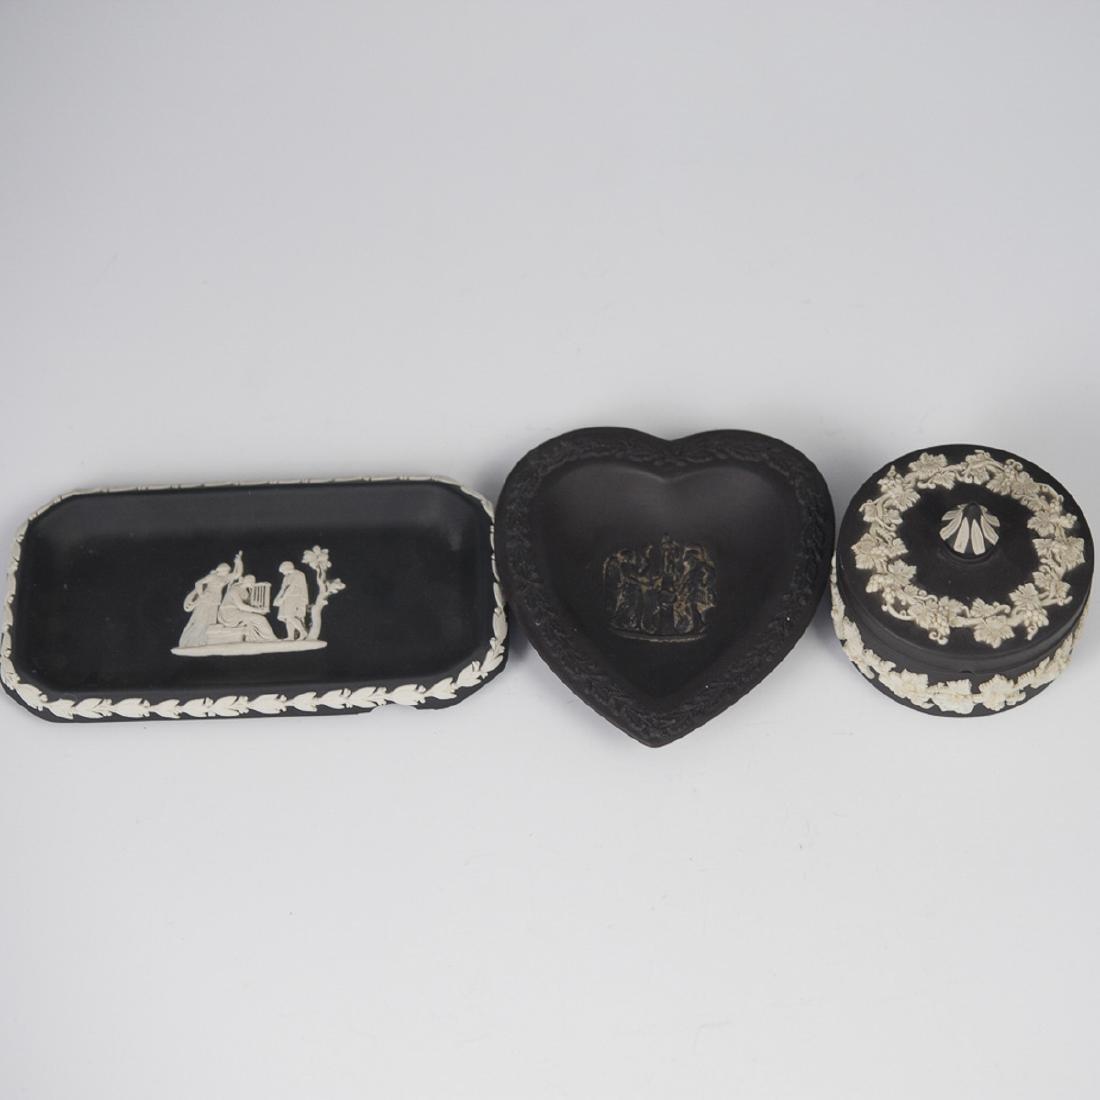 Wedgwood Black Jasperware Set